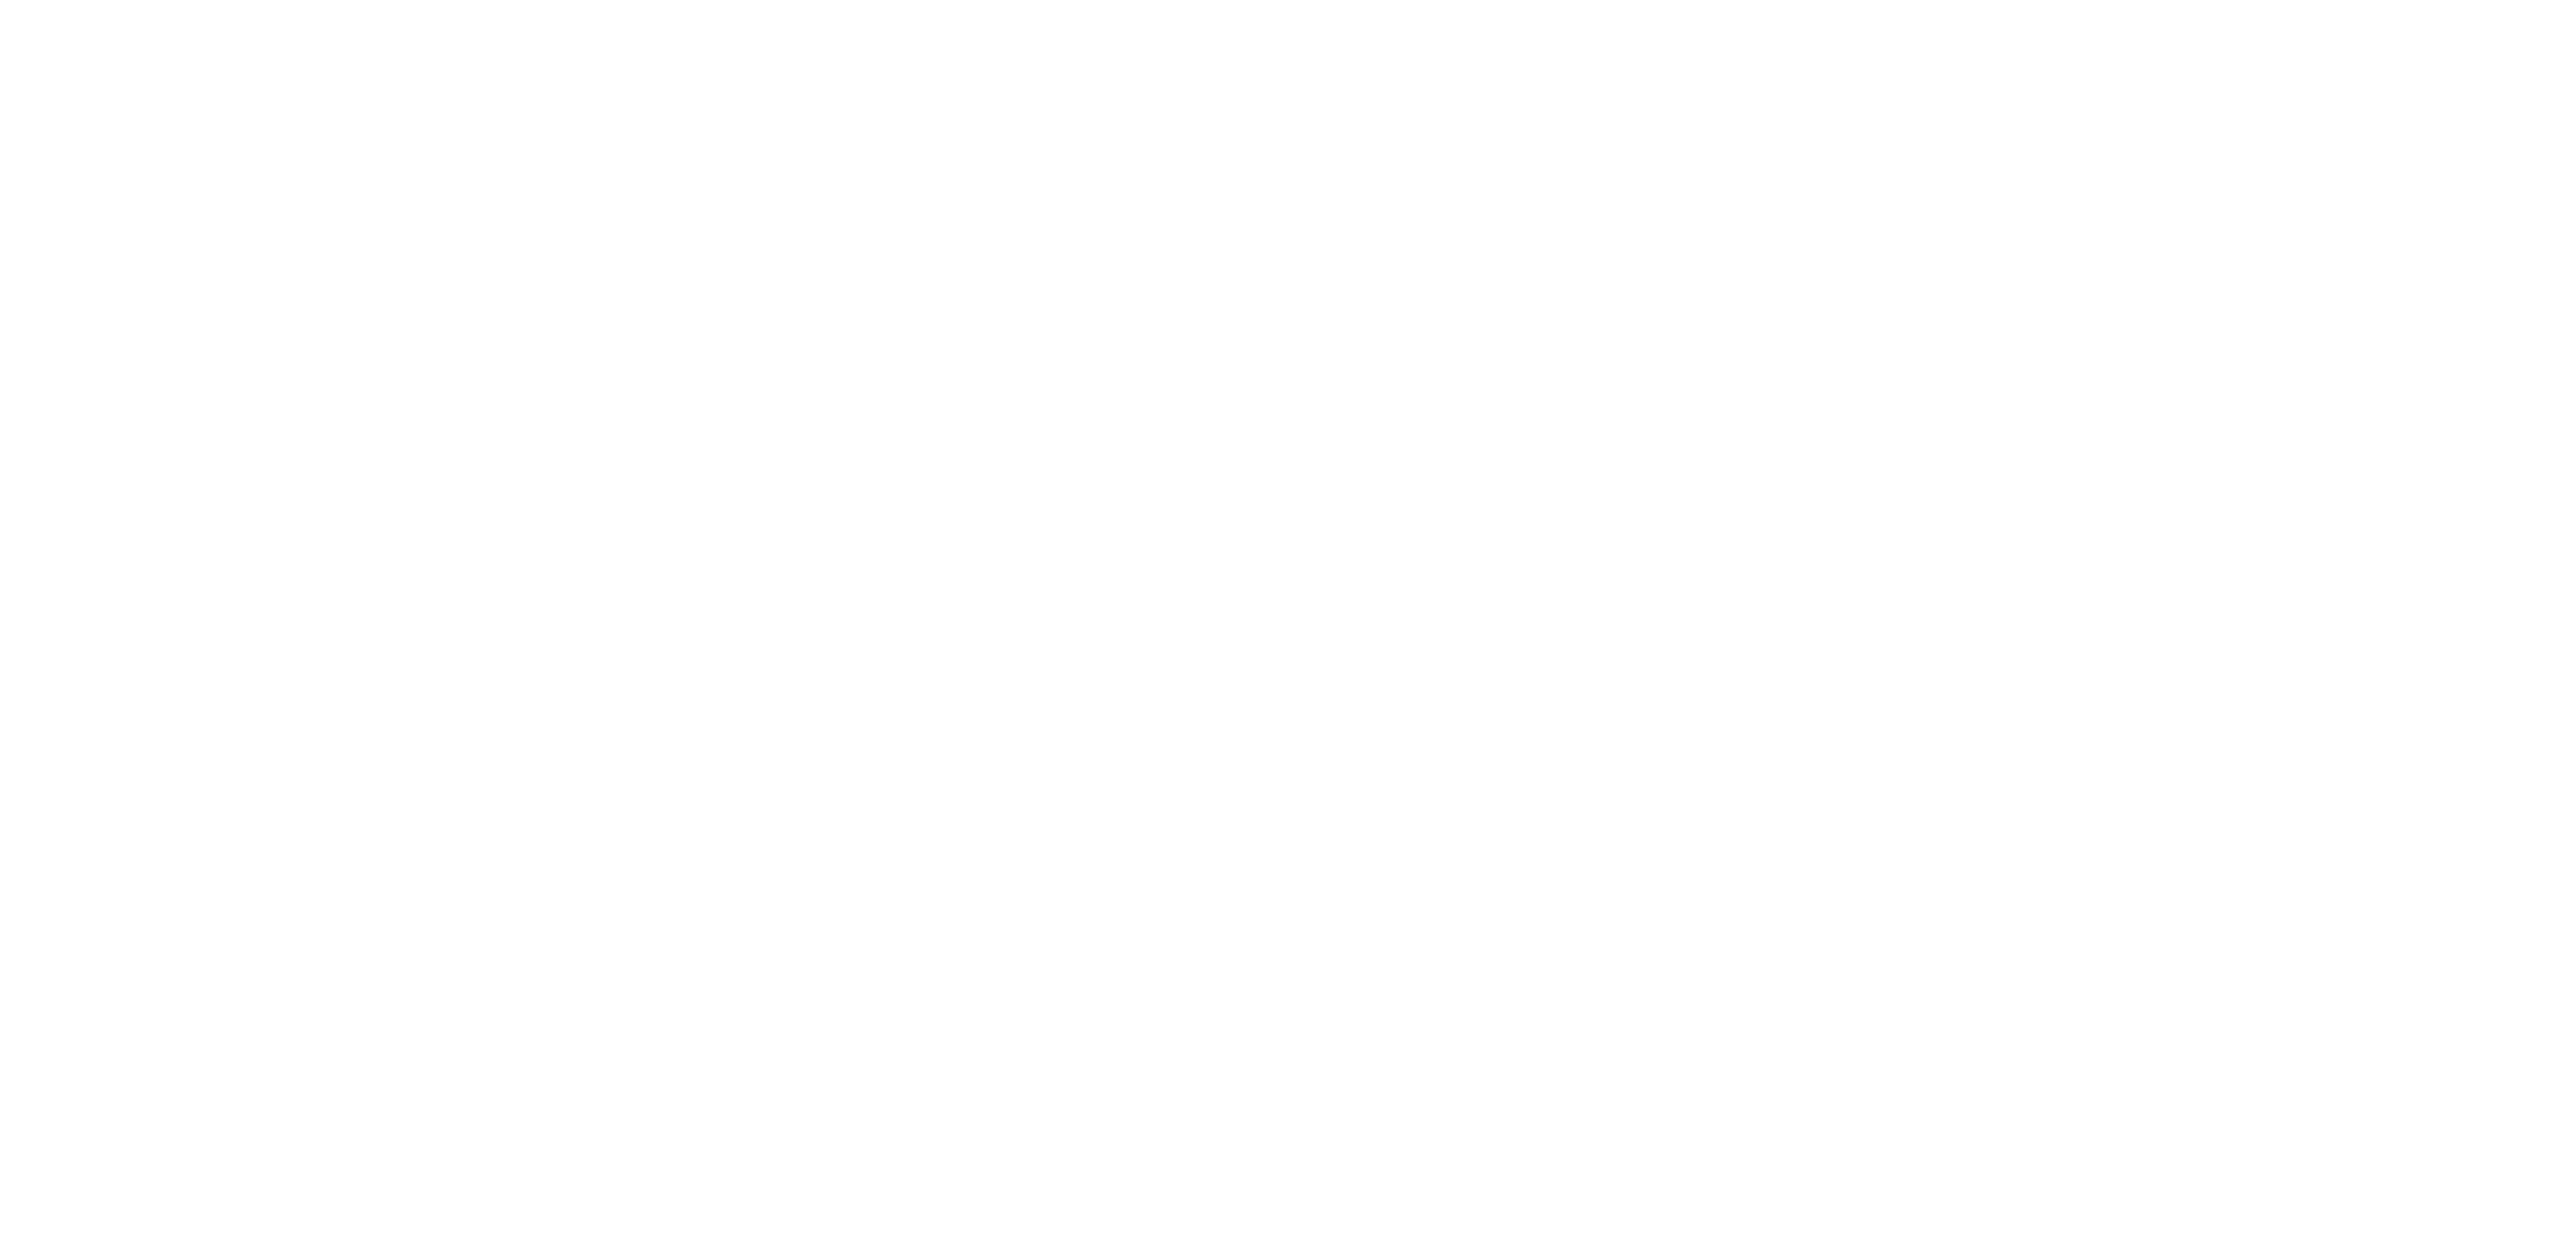 Les Tabliers